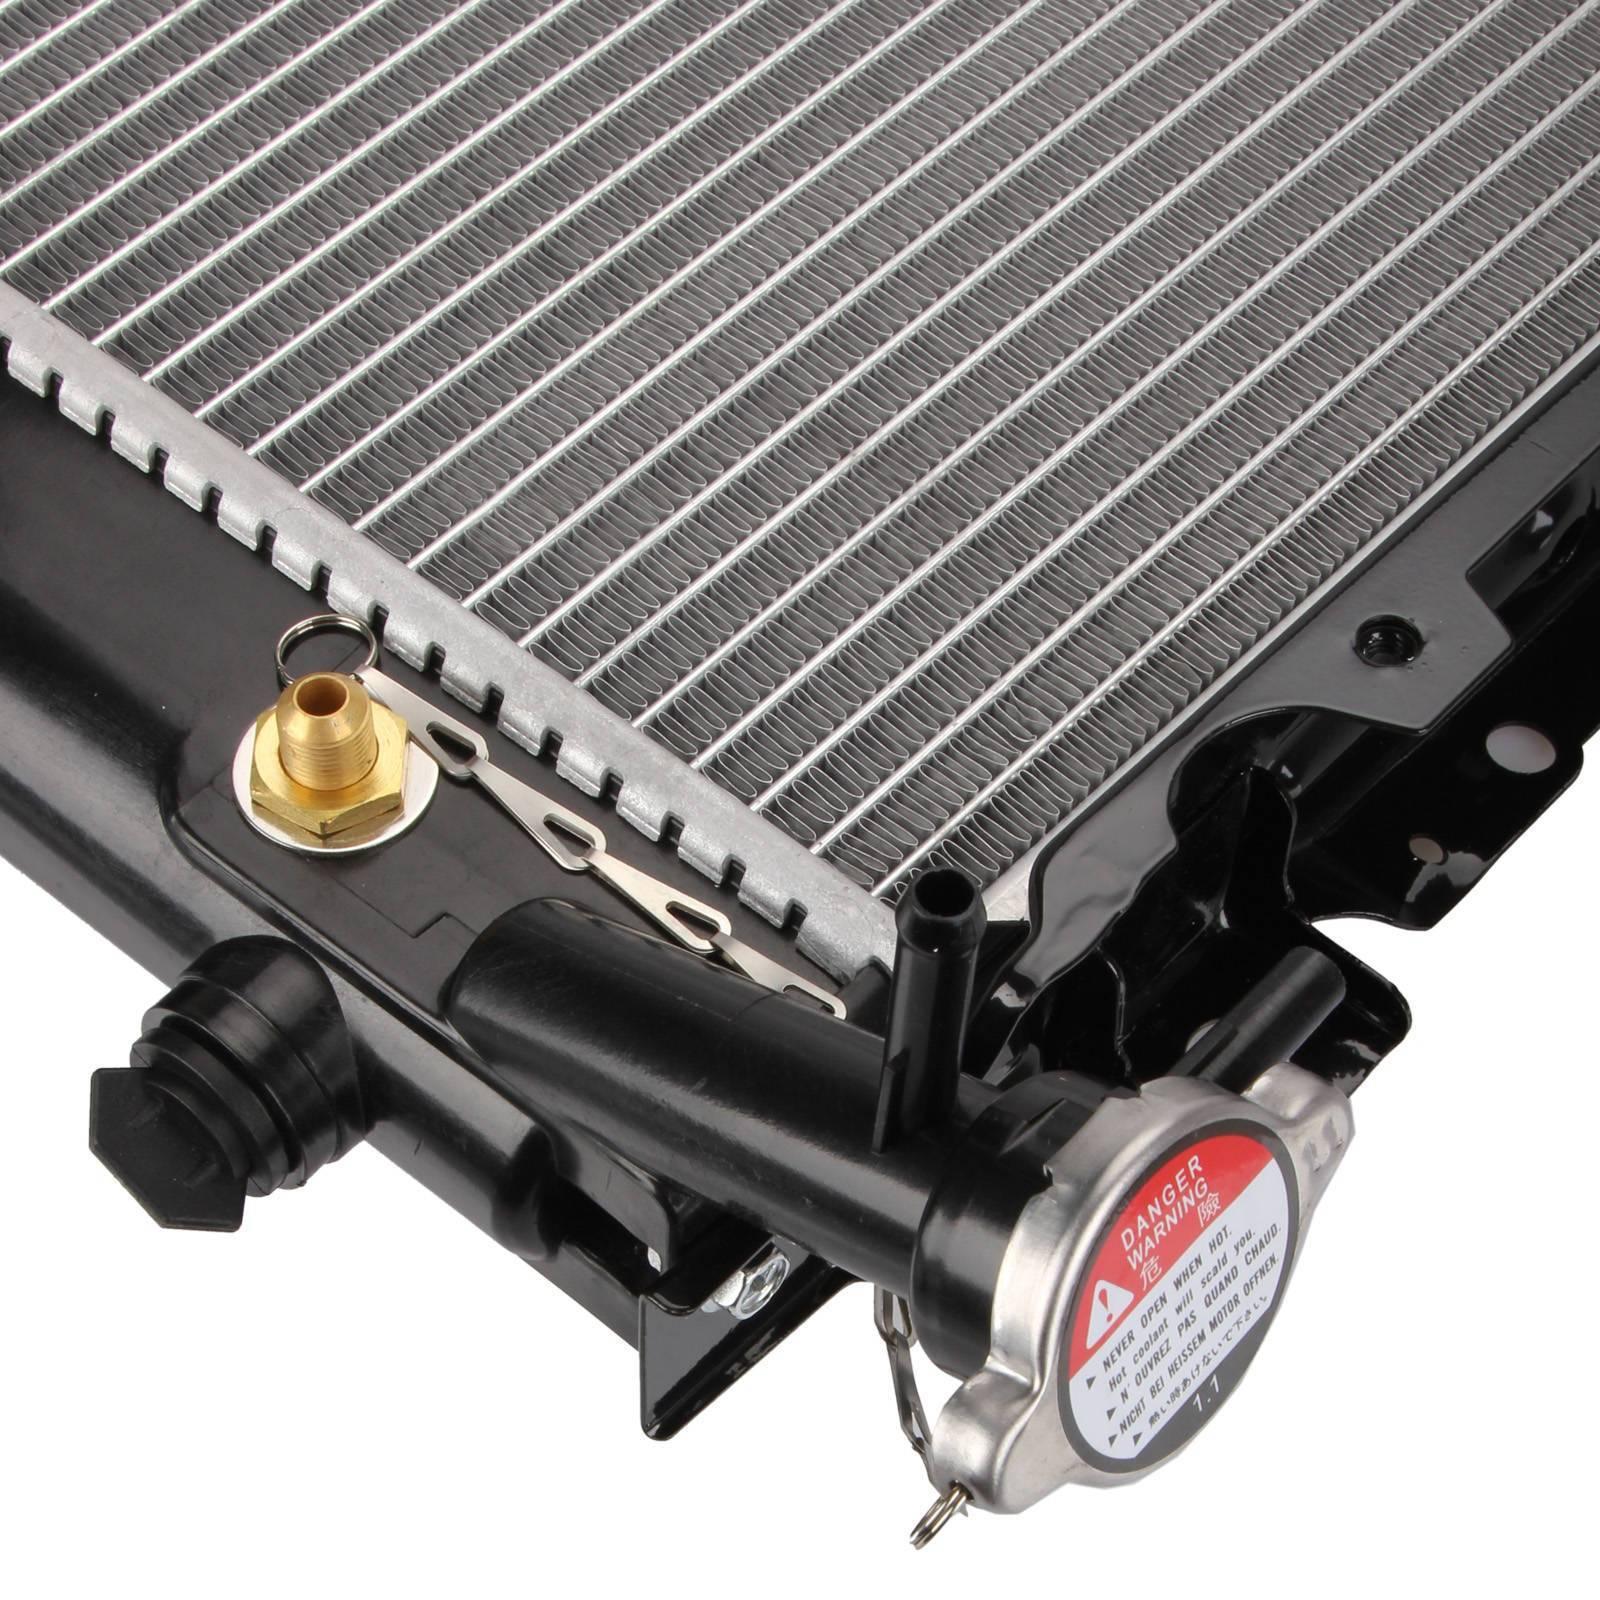 series manual automanual Dromedary Brand 2005 nissan altima radiator manufacture